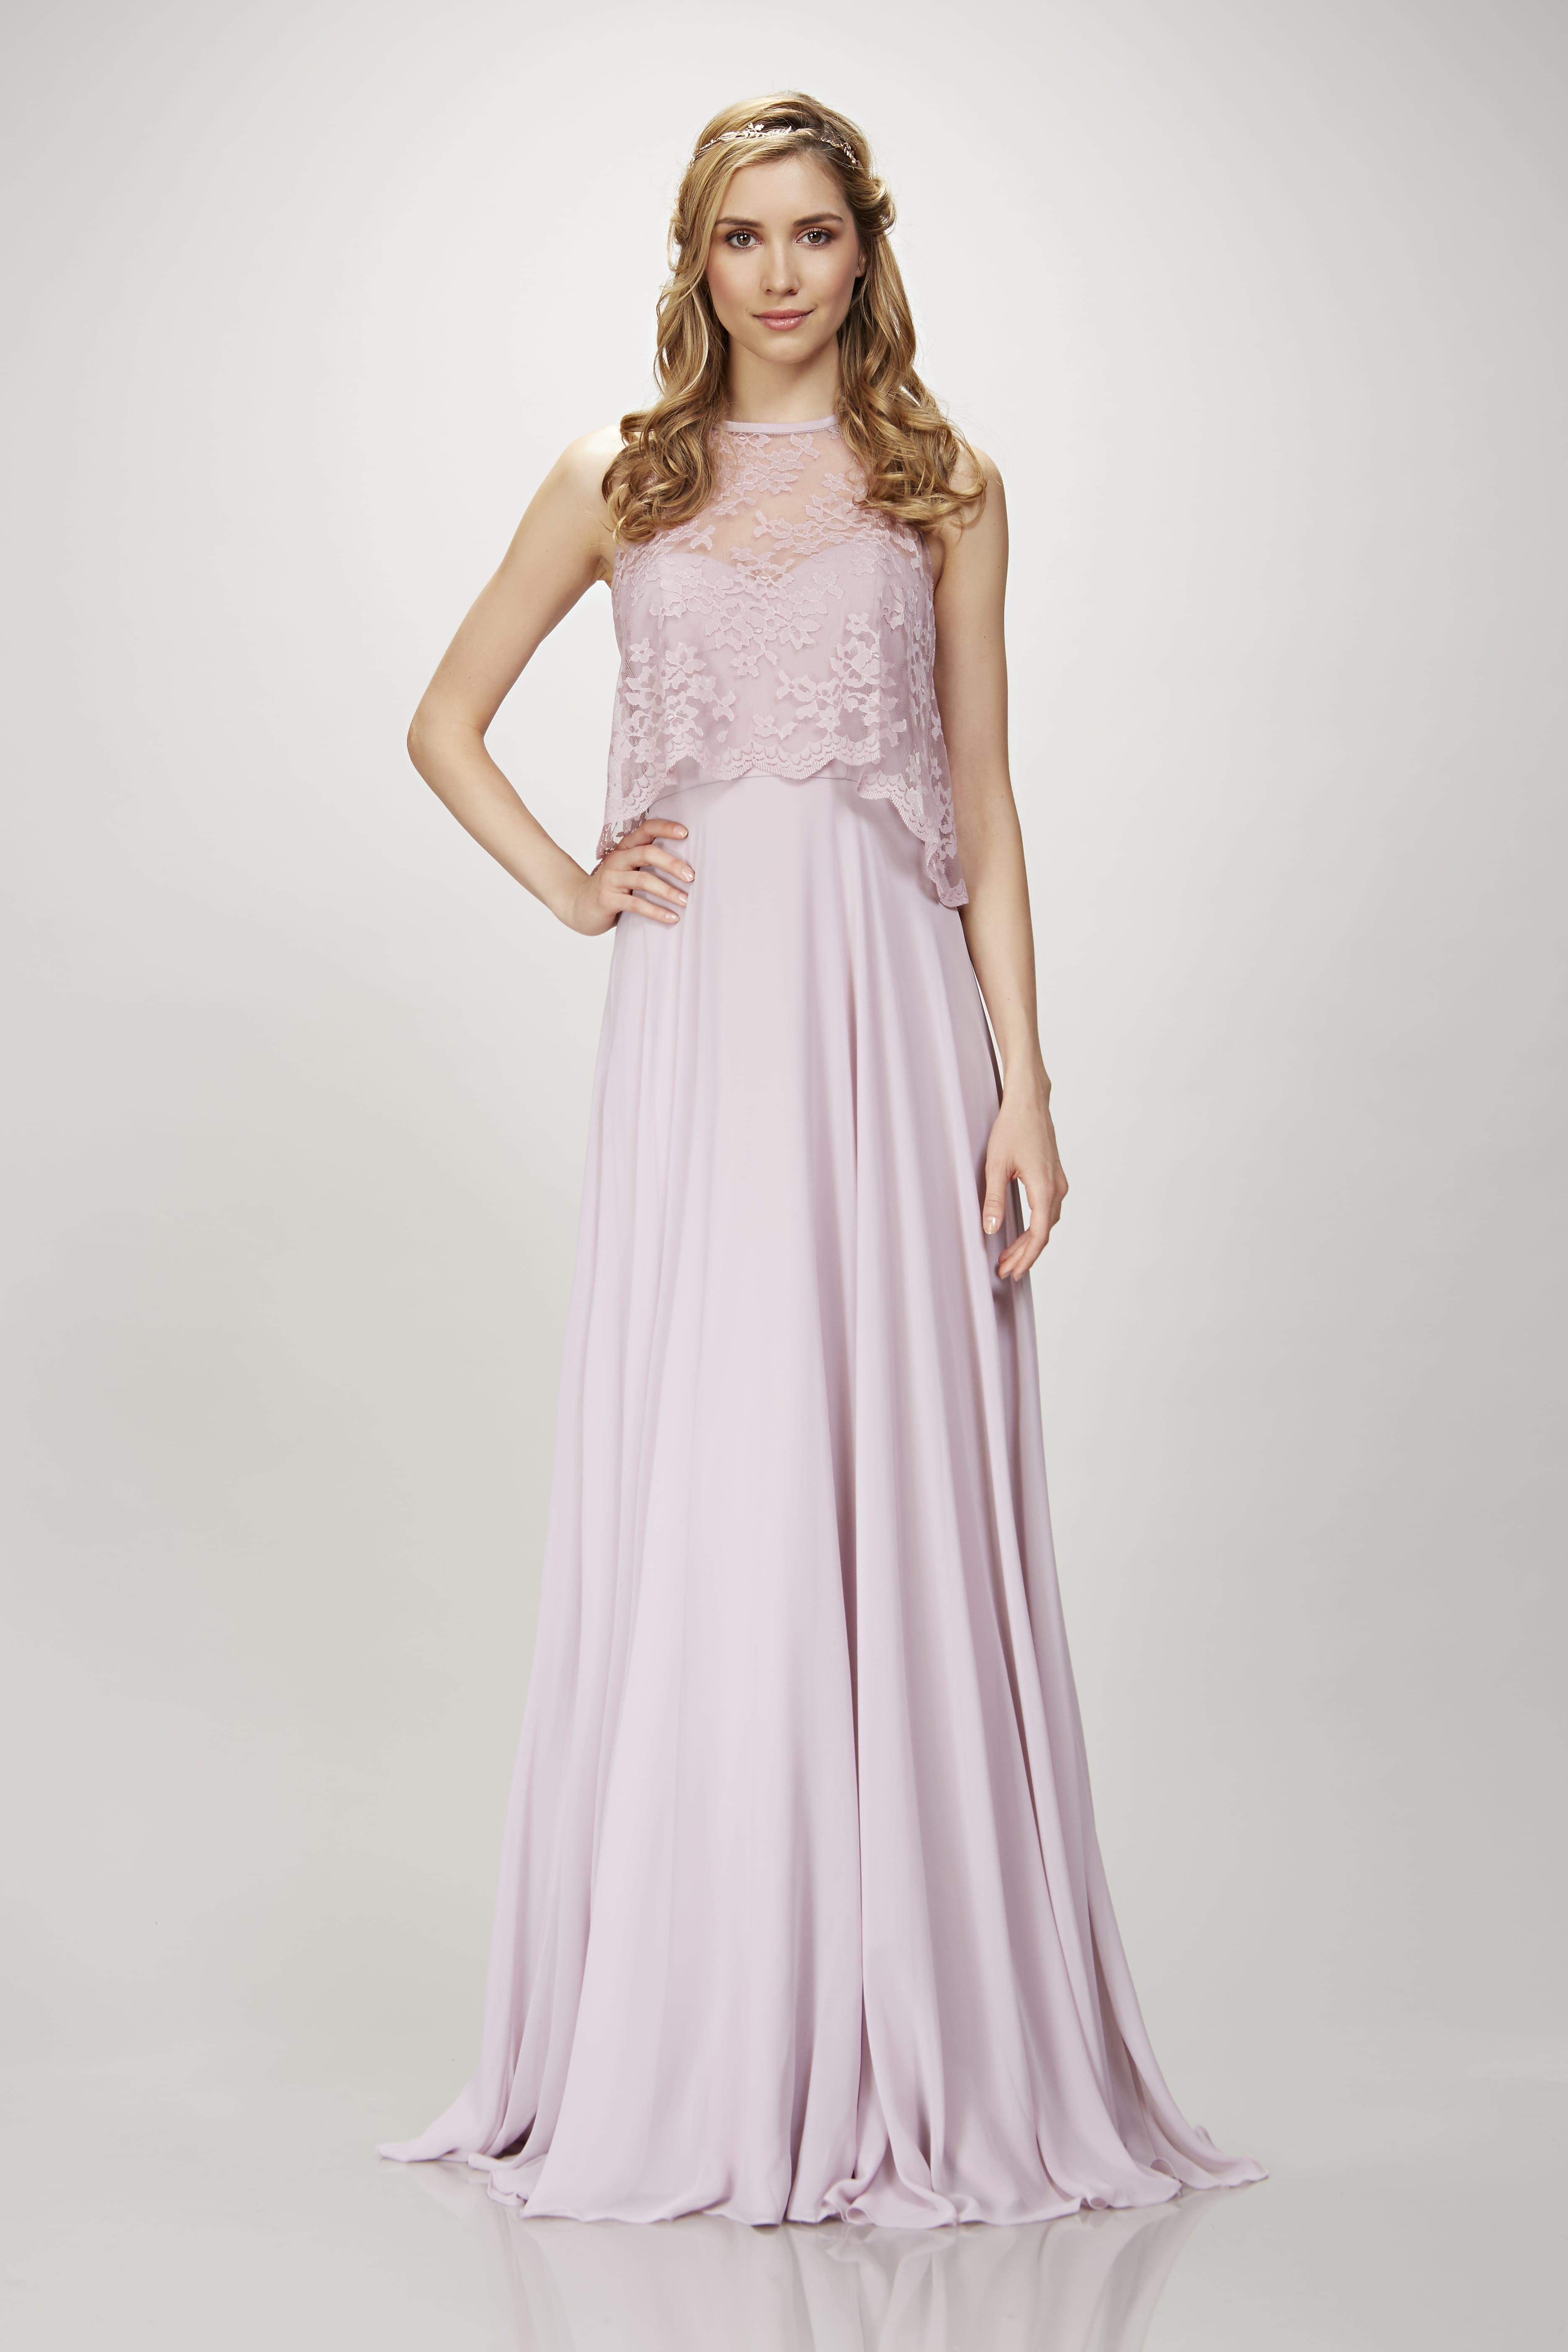 Hannah jessus wedding bridesmaid dress pinterest wedding